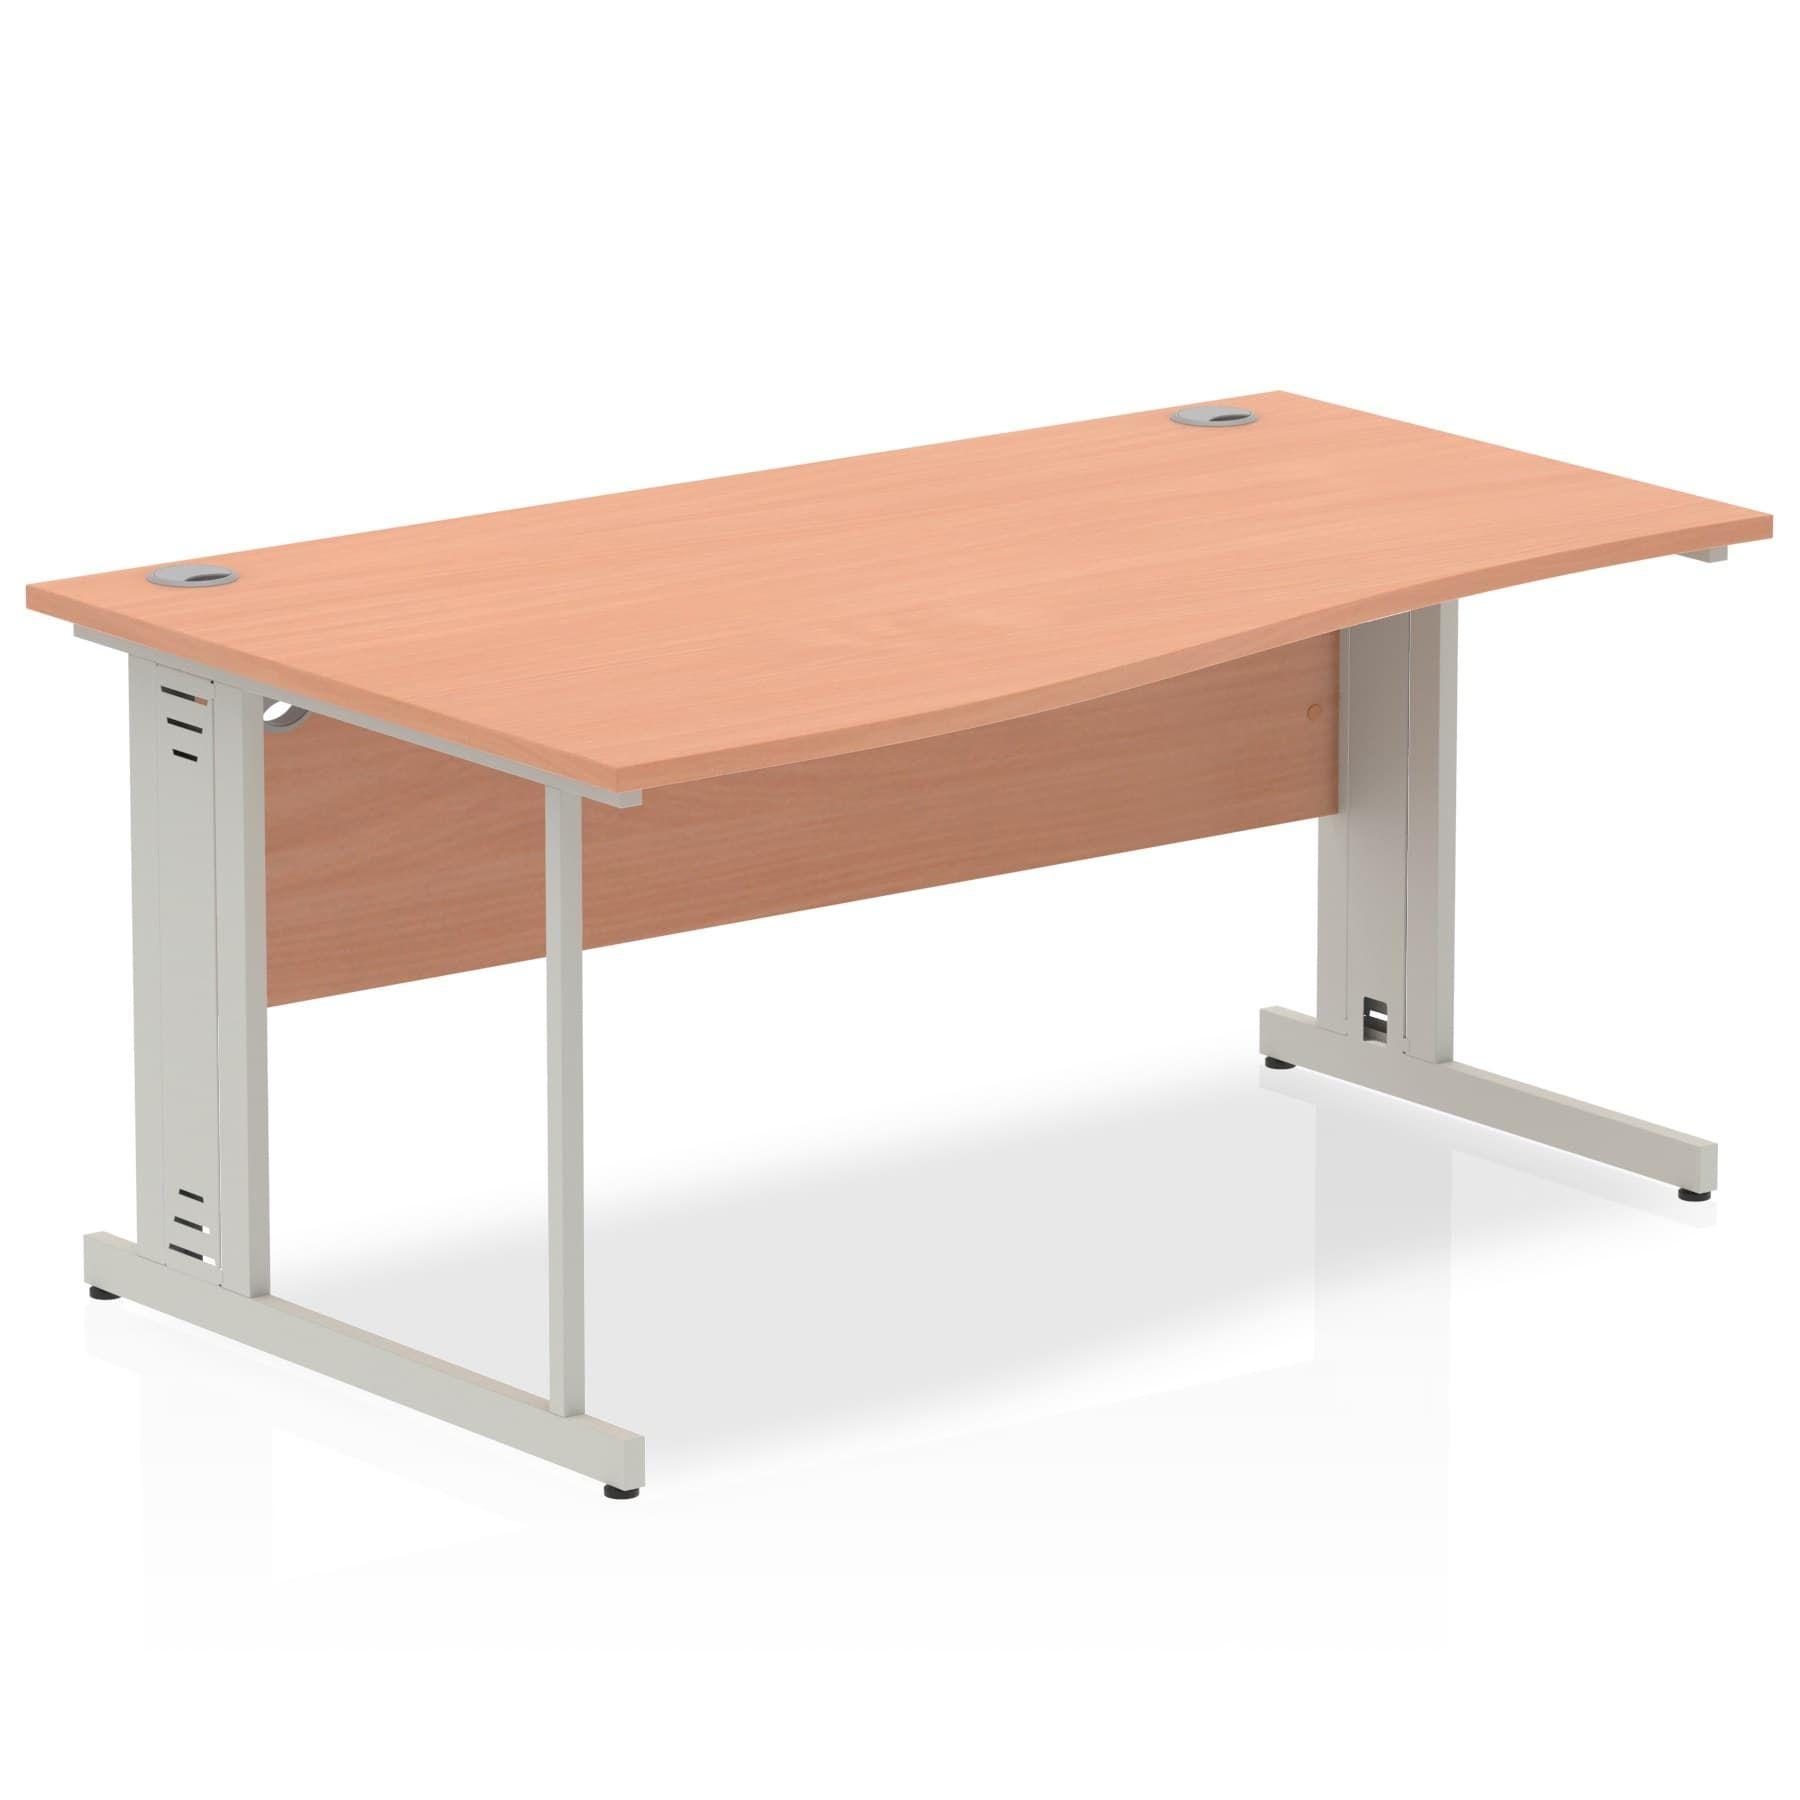 Impulse 1600 Left Hand Wave Desk